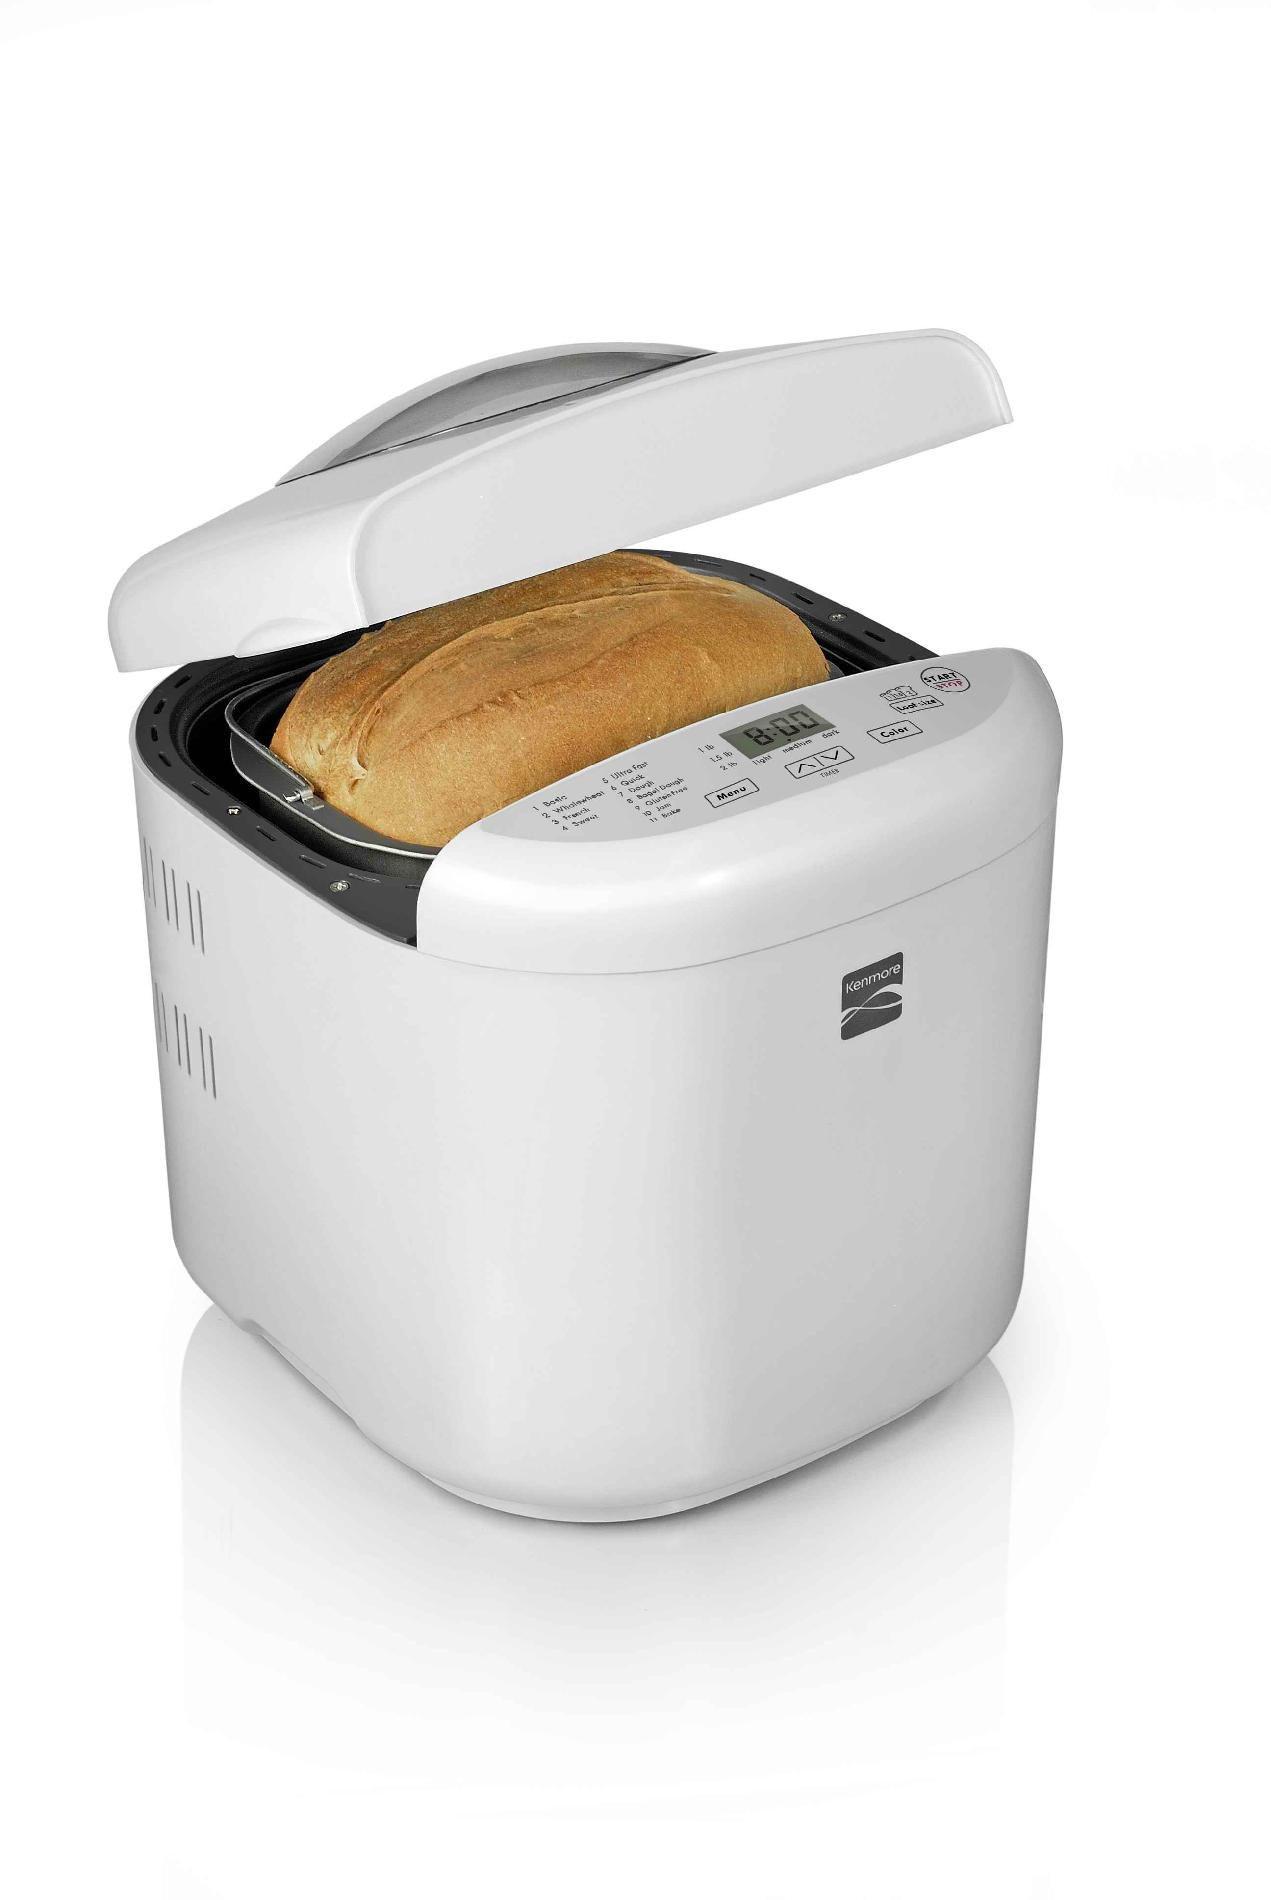 Bread Making Machine  Kenmore 2LB Bread Maker